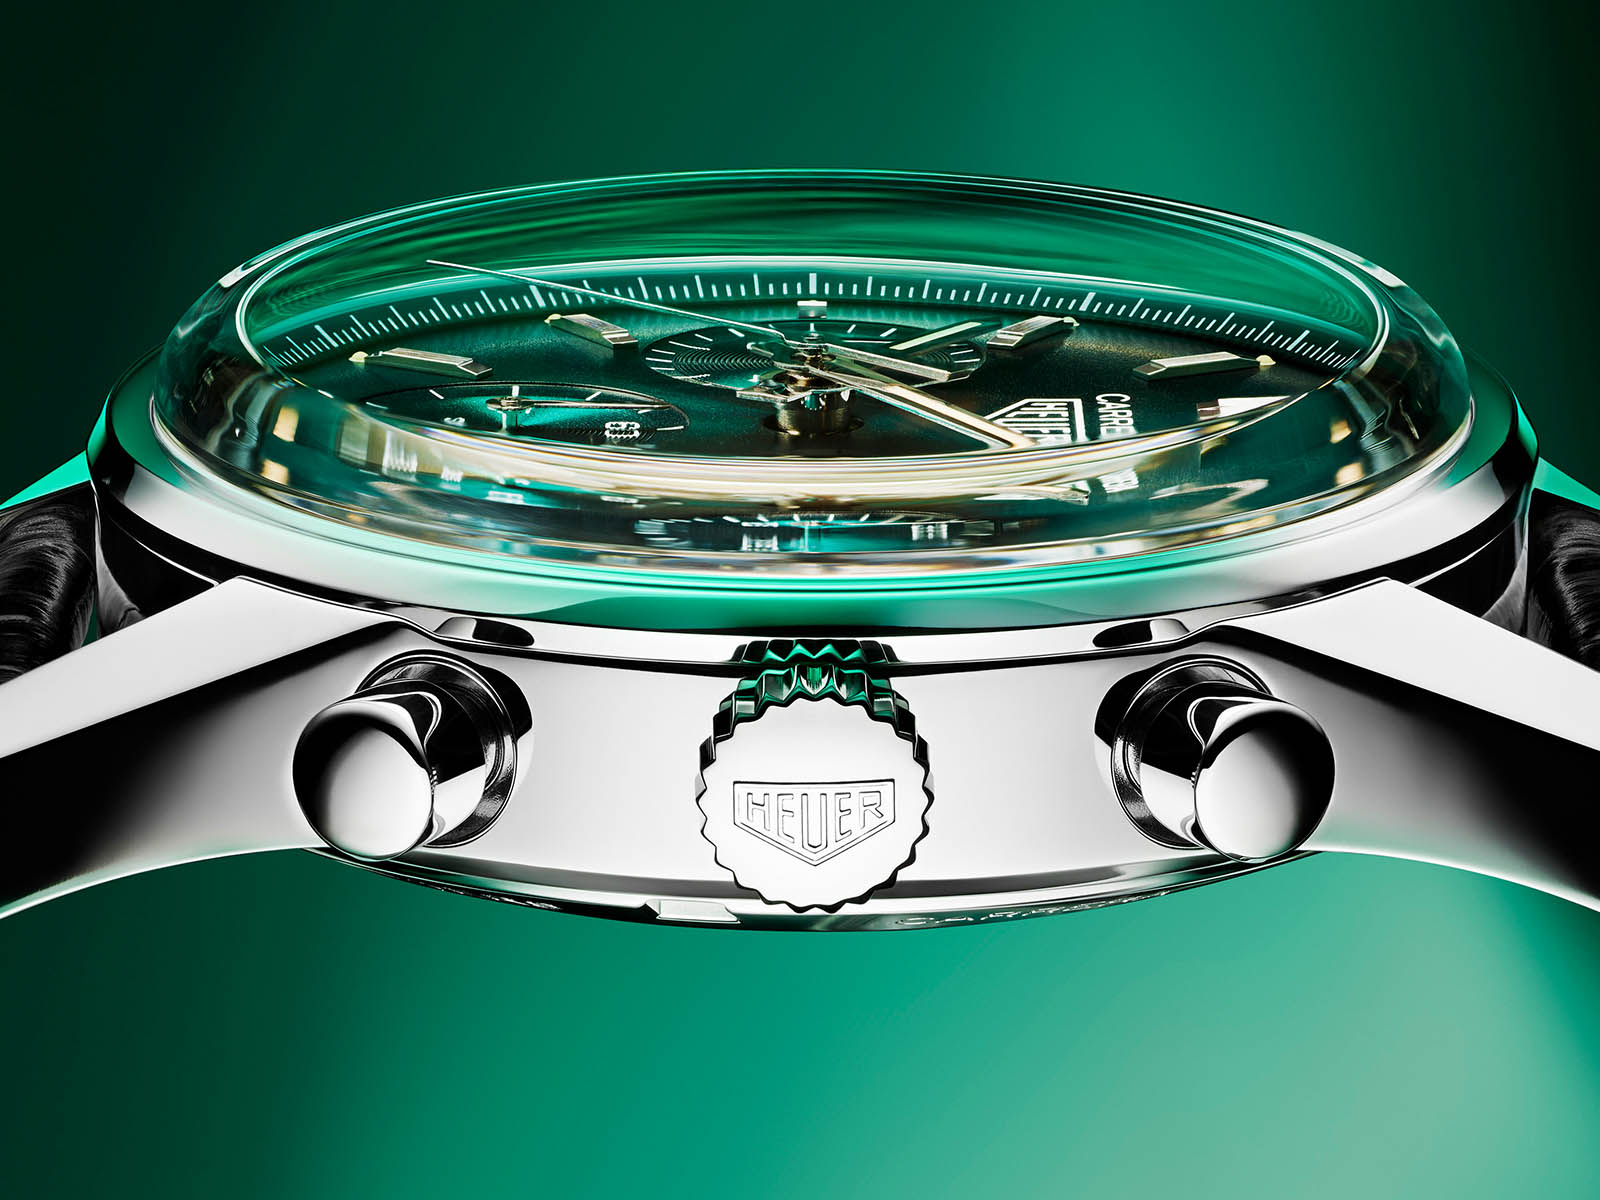 cbk221f-fc6479-tag-heuer-carrera-green-special-edition-5.jpg